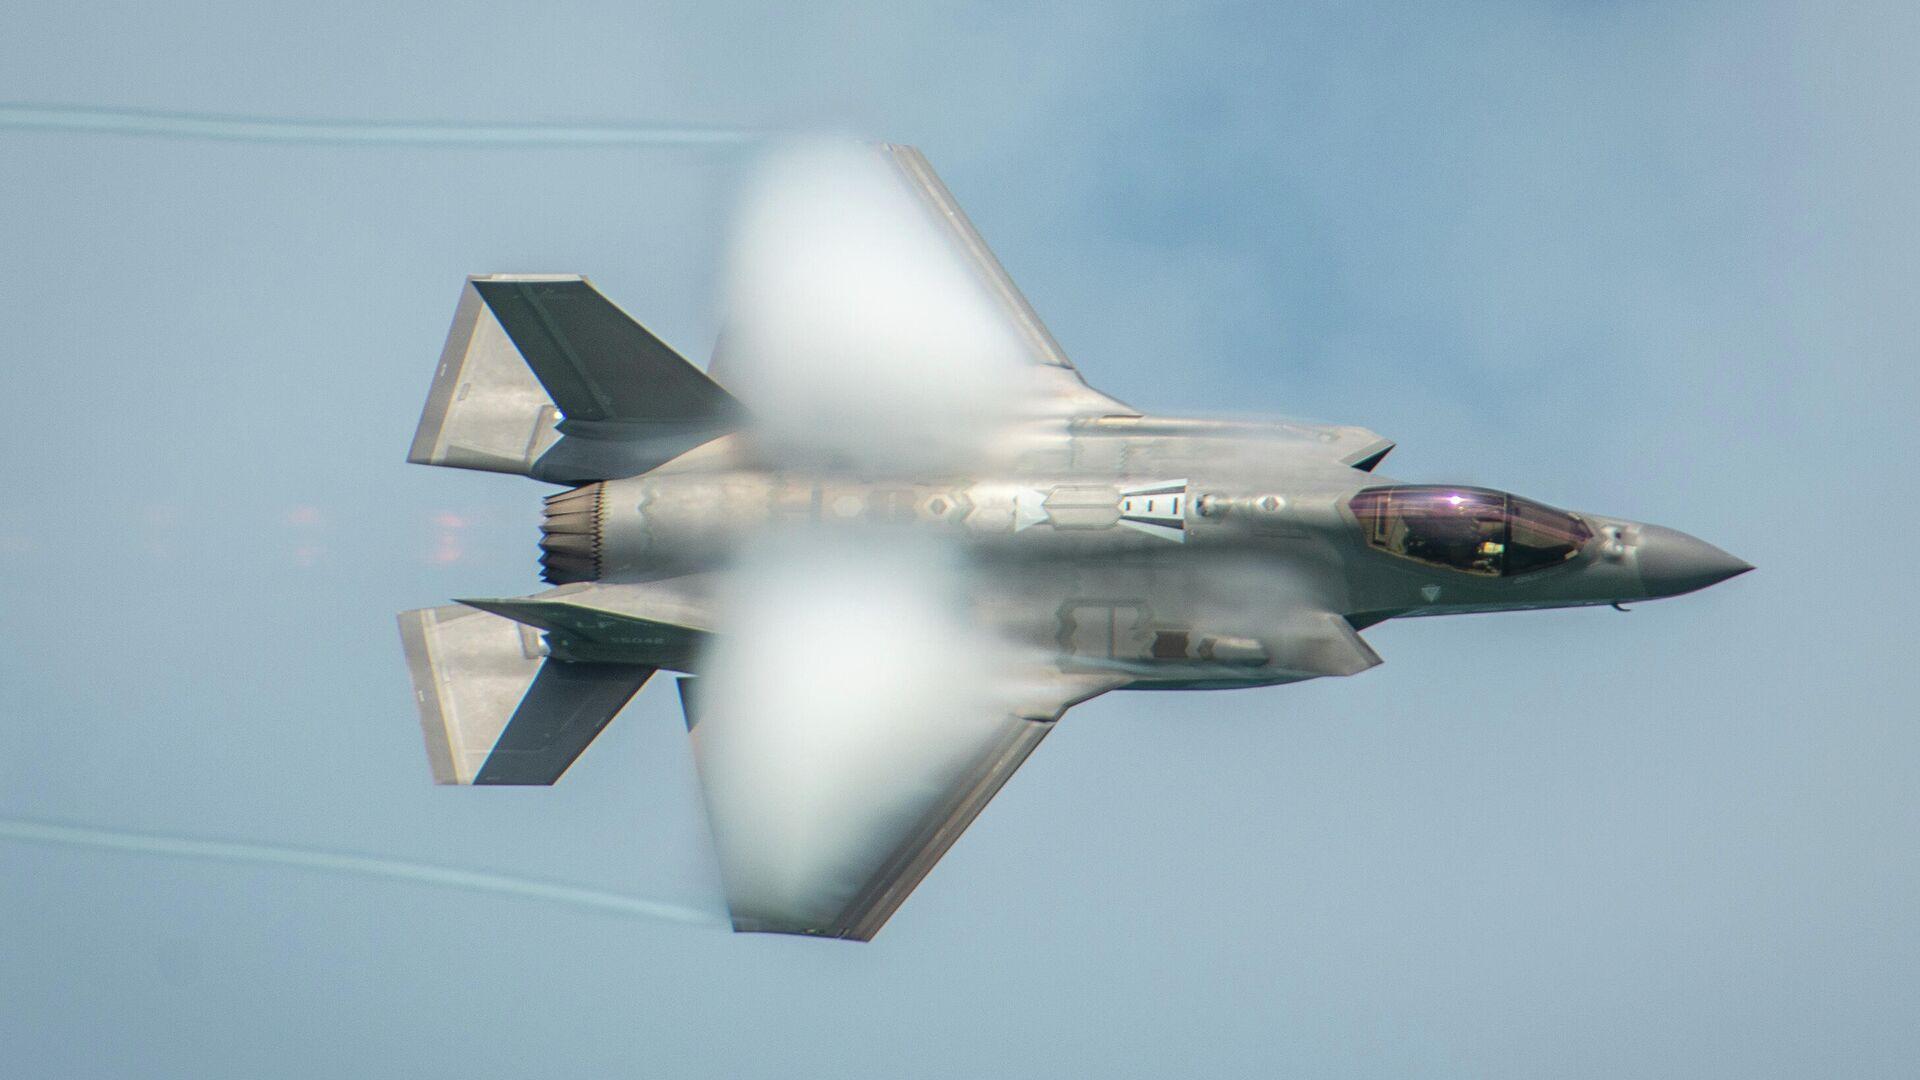 Американский истребитель F-35A Lightning II - РИА Новости, 1920, 21.11.2020